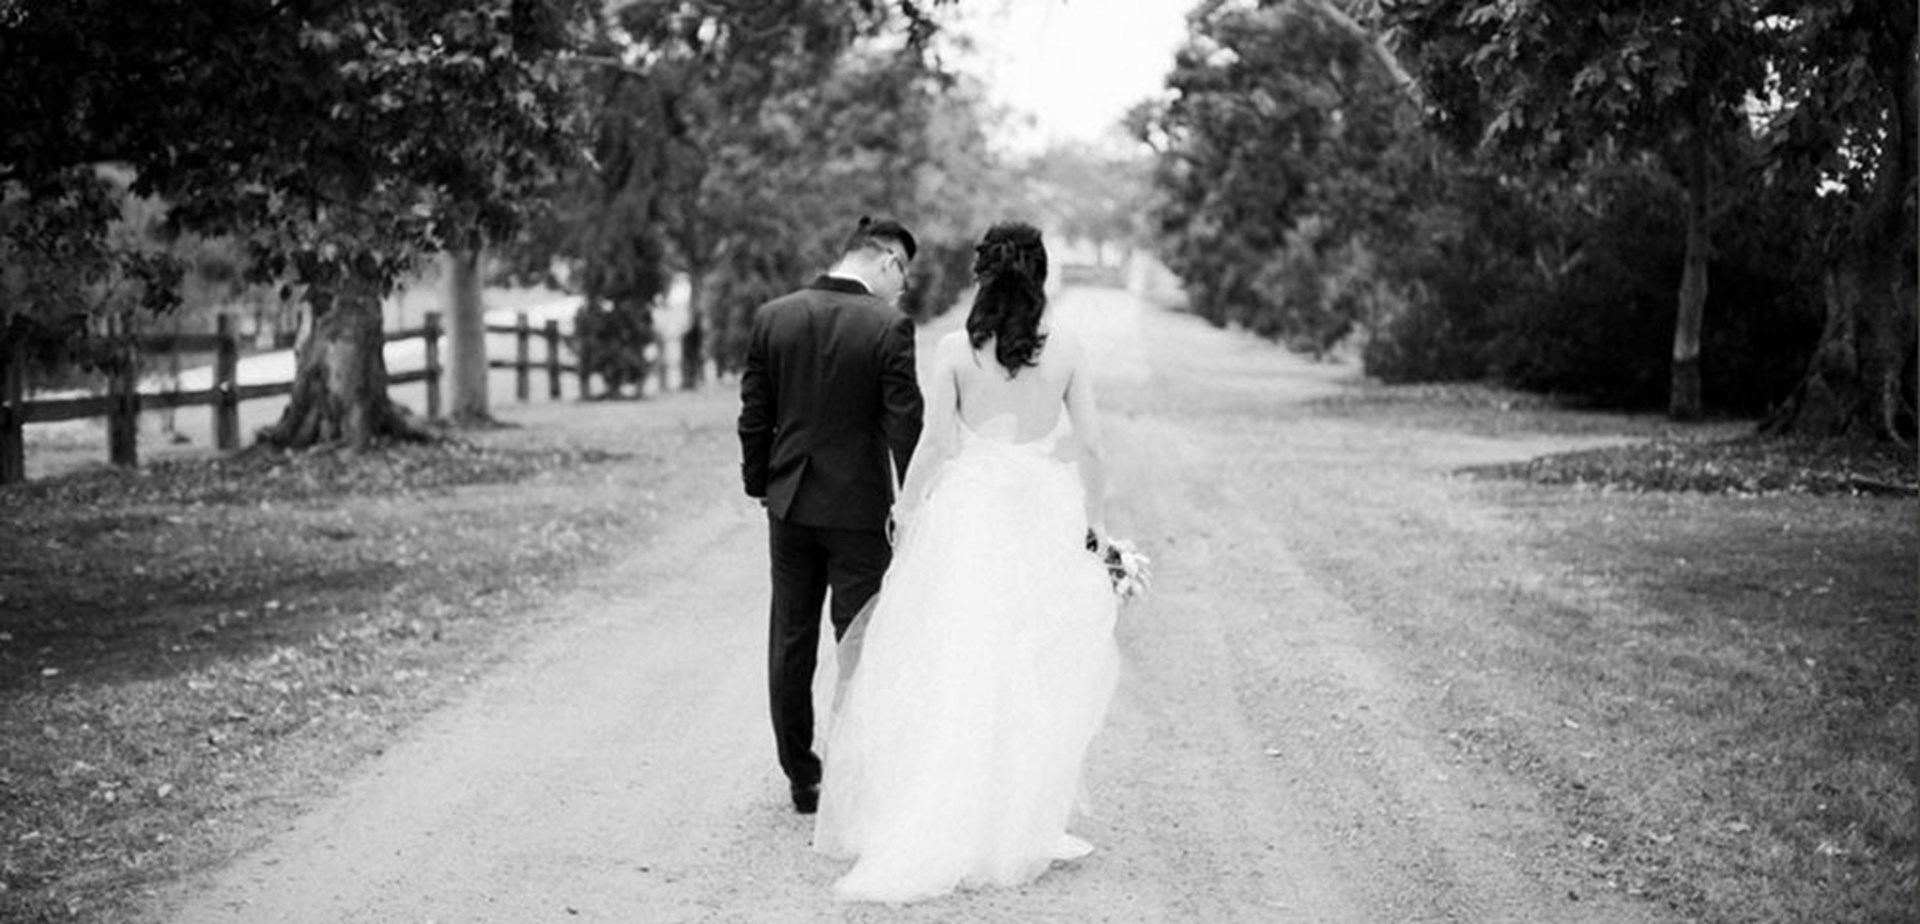 Wedding Venue - Spicers Hidden Vale 4 on Veilability